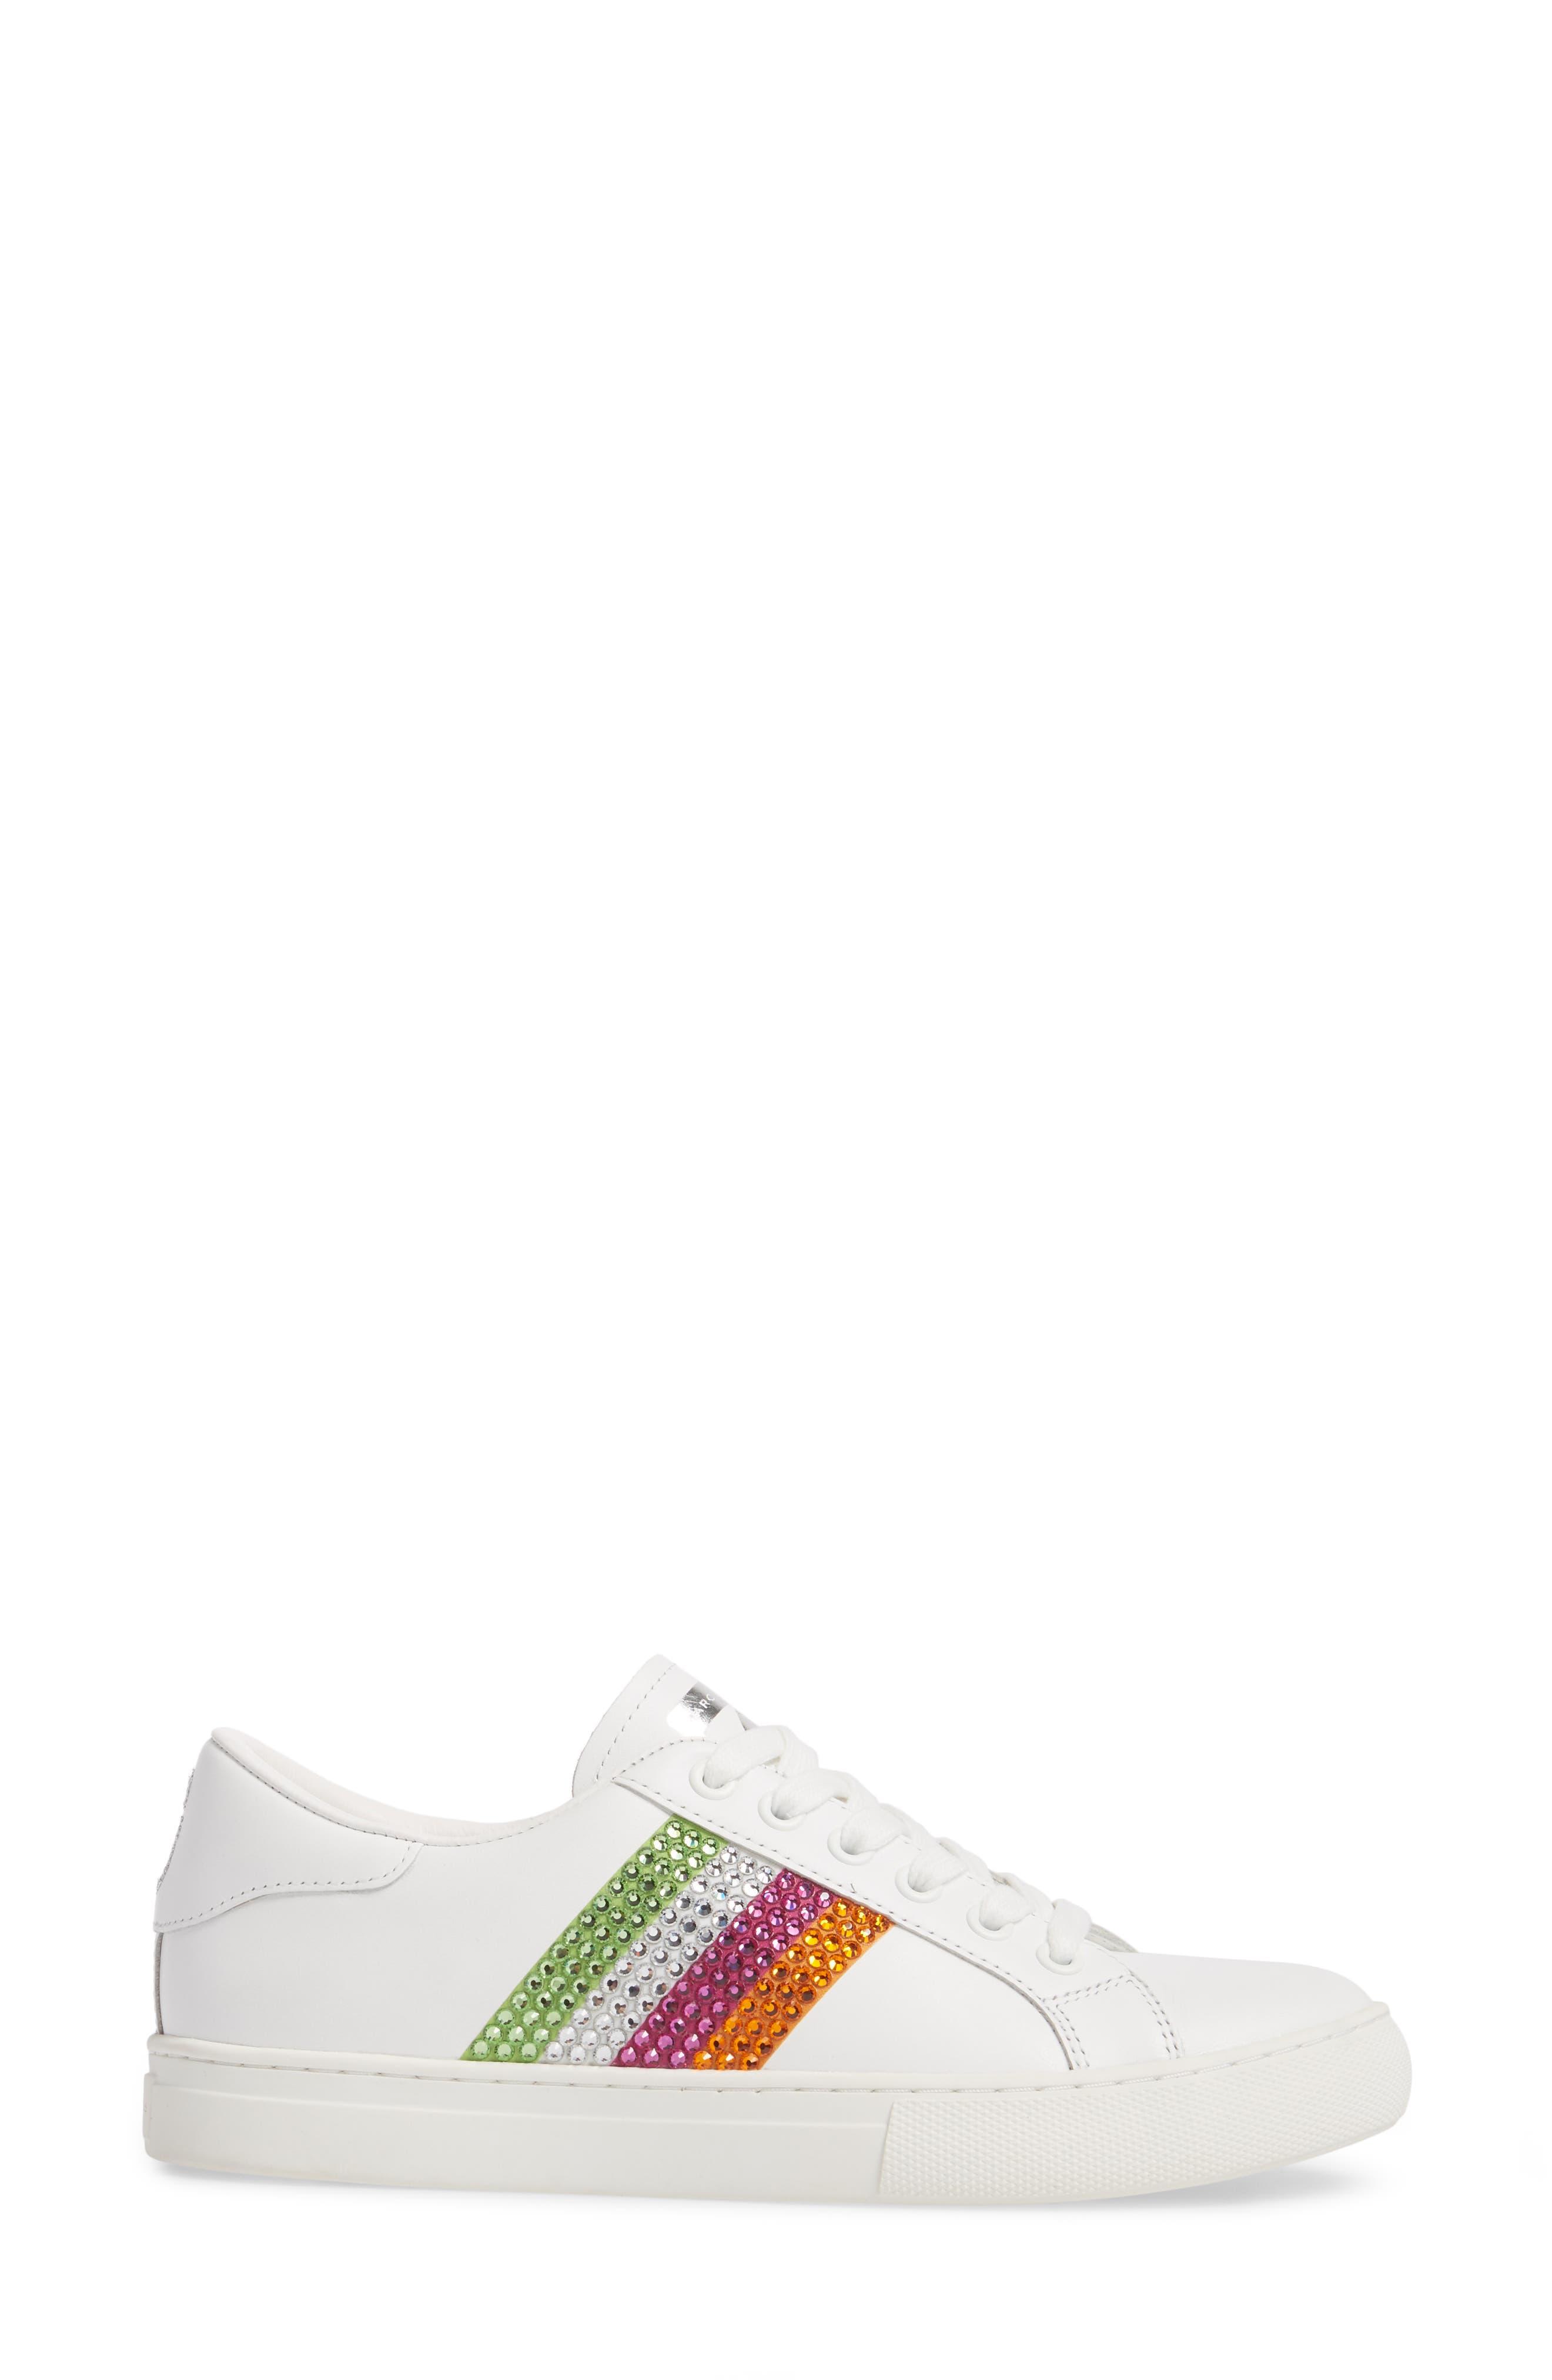 Alternate Image 3  - MARC JACOBS Empire Crystal Embellished Sneaker (Women)